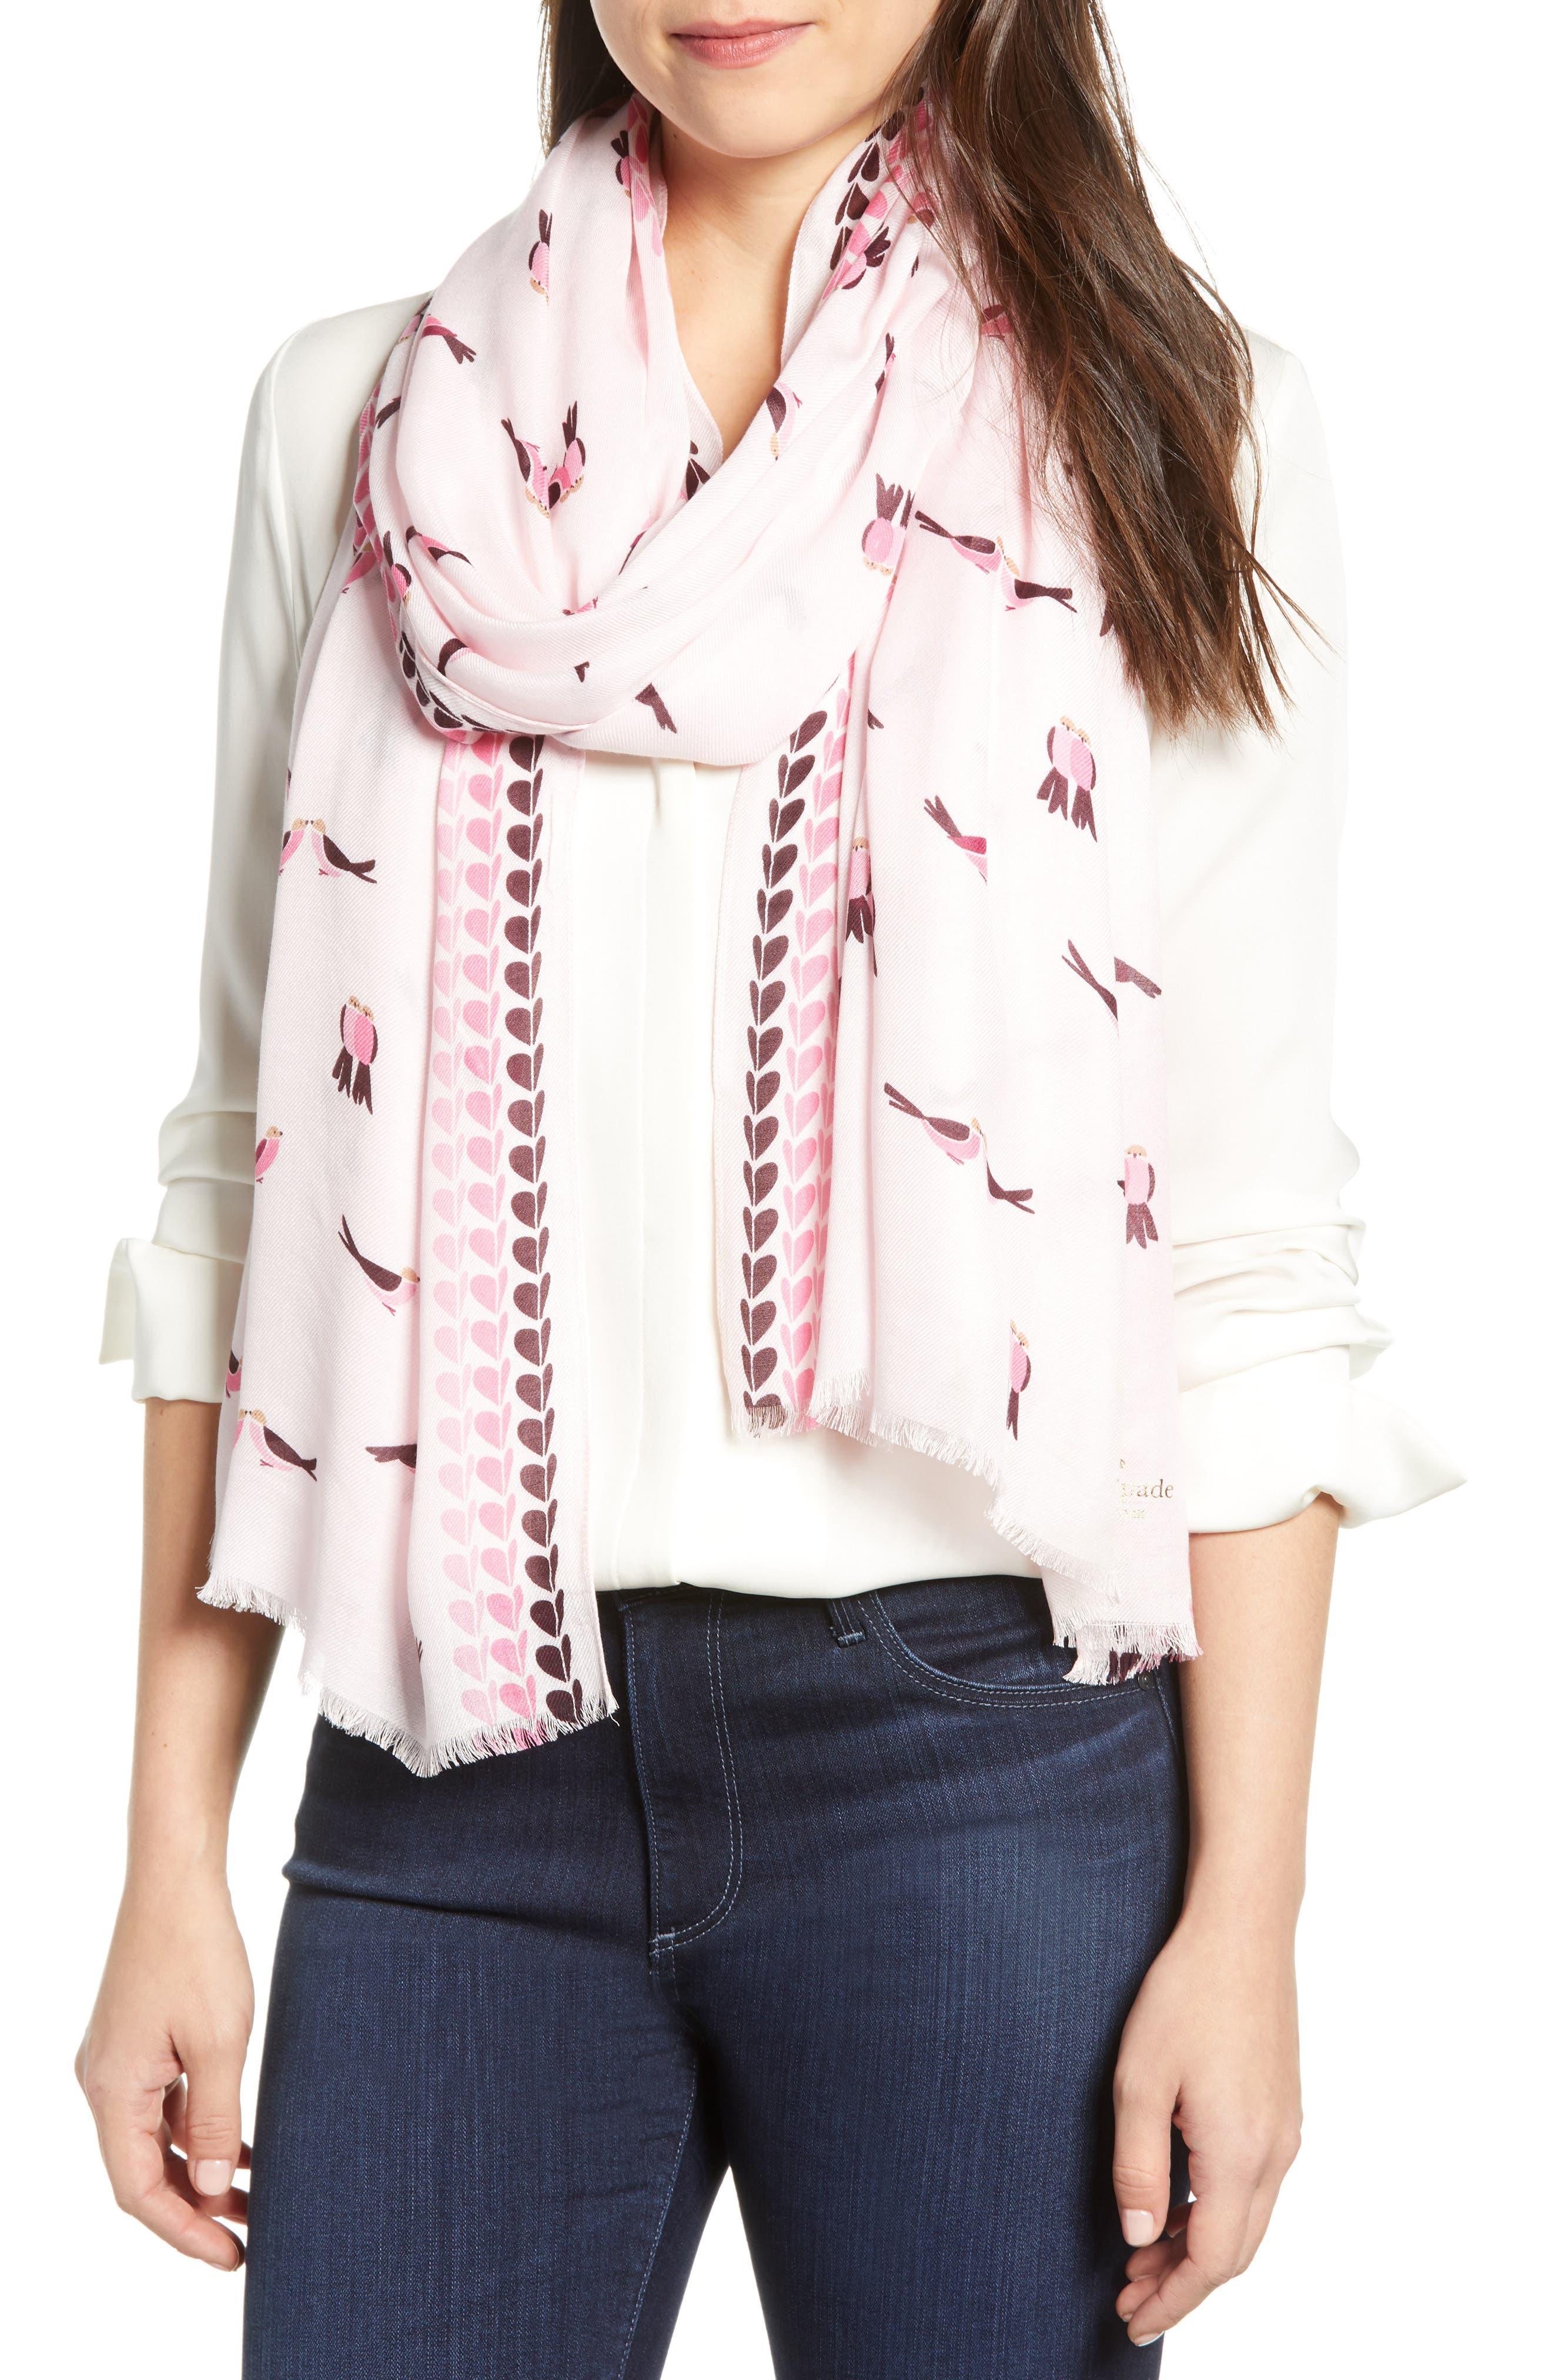 KATE SPADE NEW YORK,                             lovebirds scarf,                             Main thumbnail 1, color,                             PINK MAJOLICA